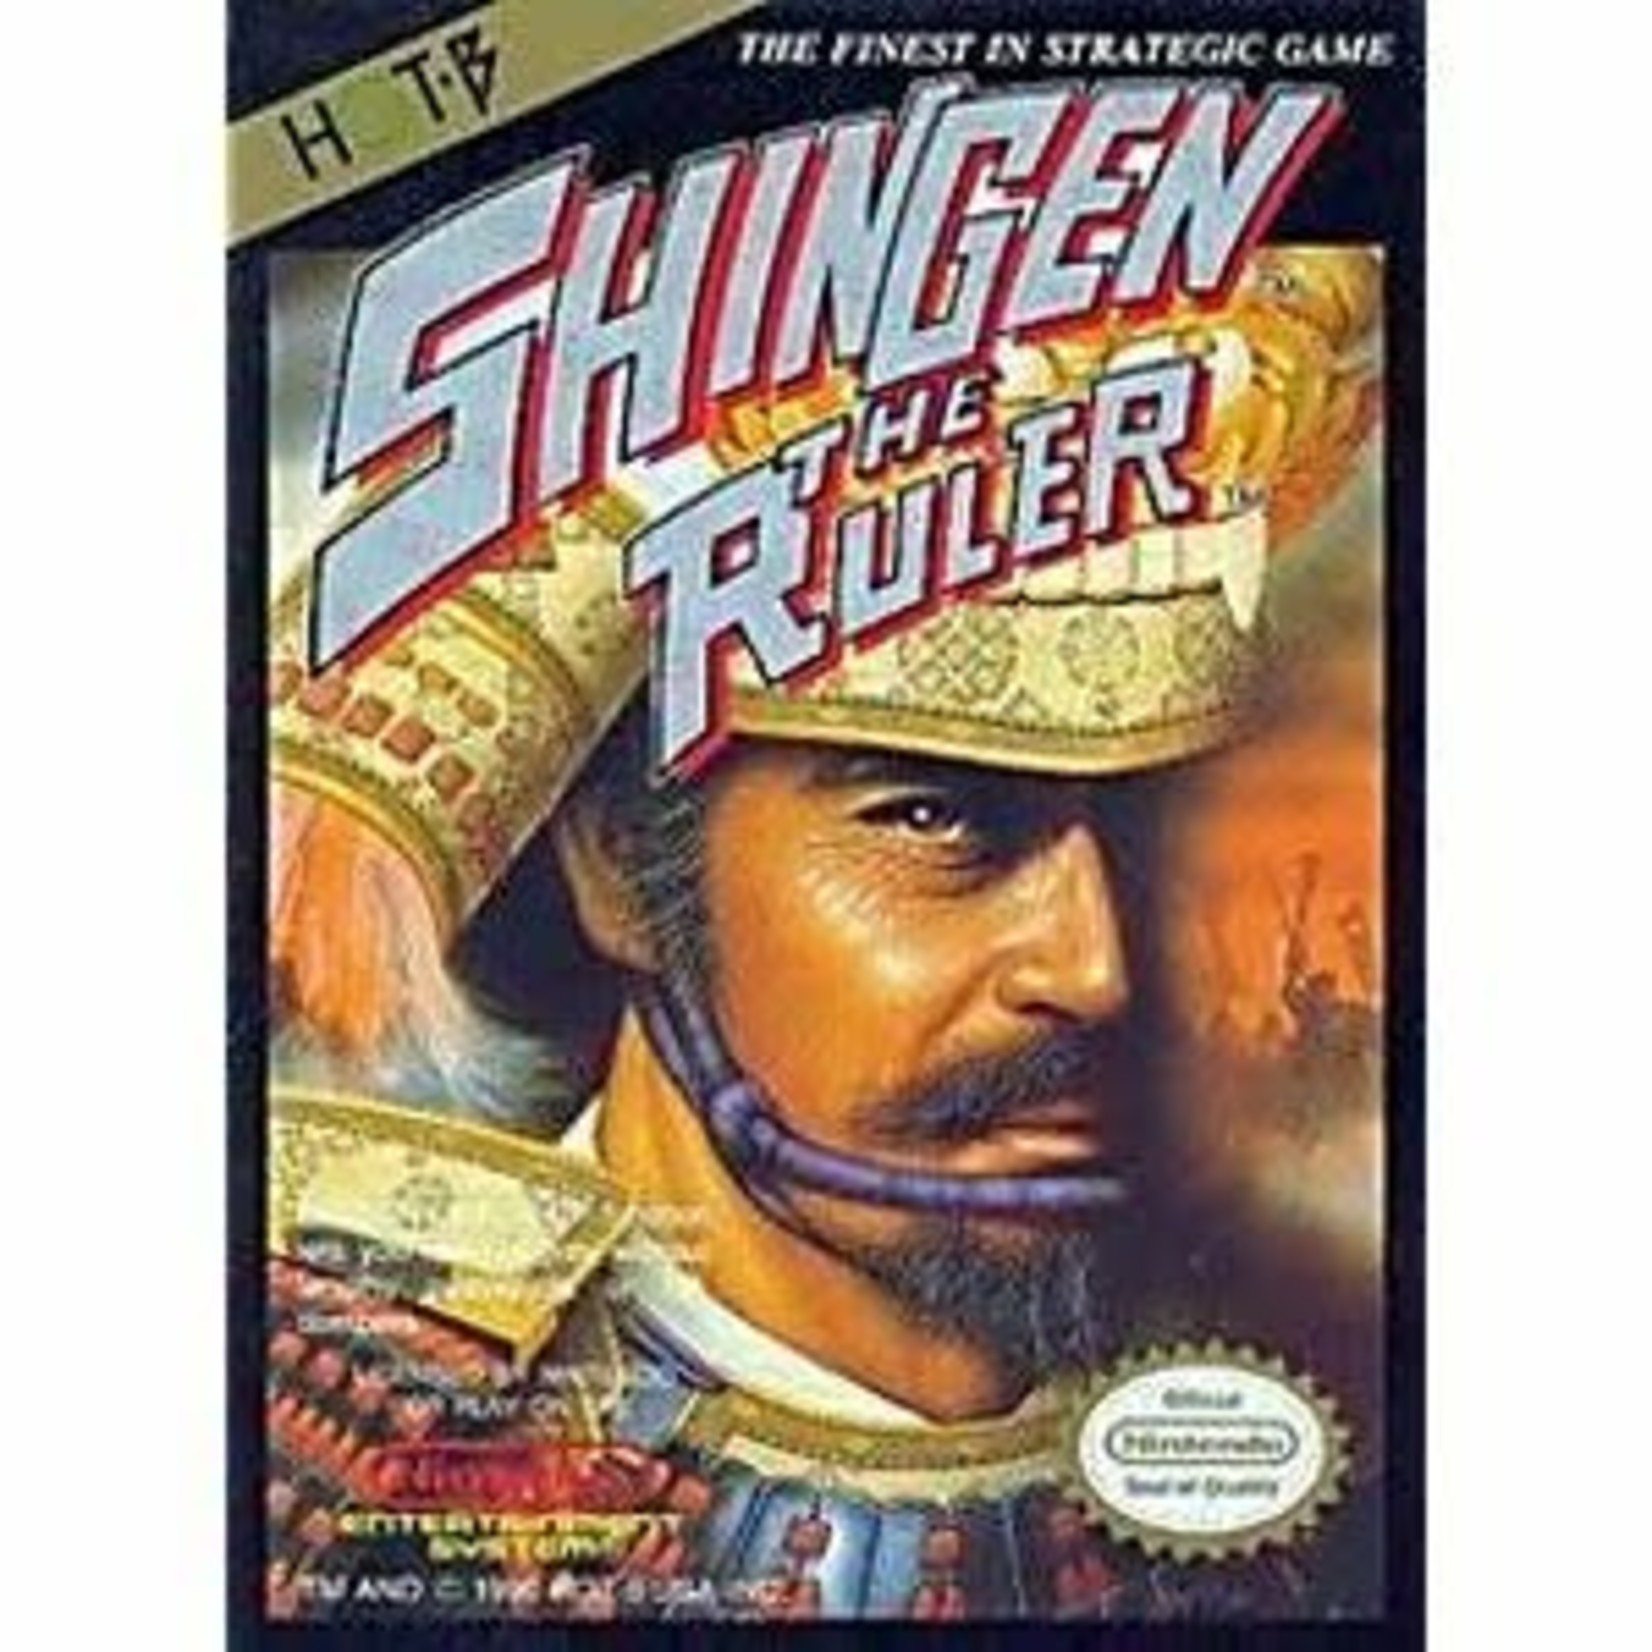 NESu-Shingen the Ruler (hardcase)